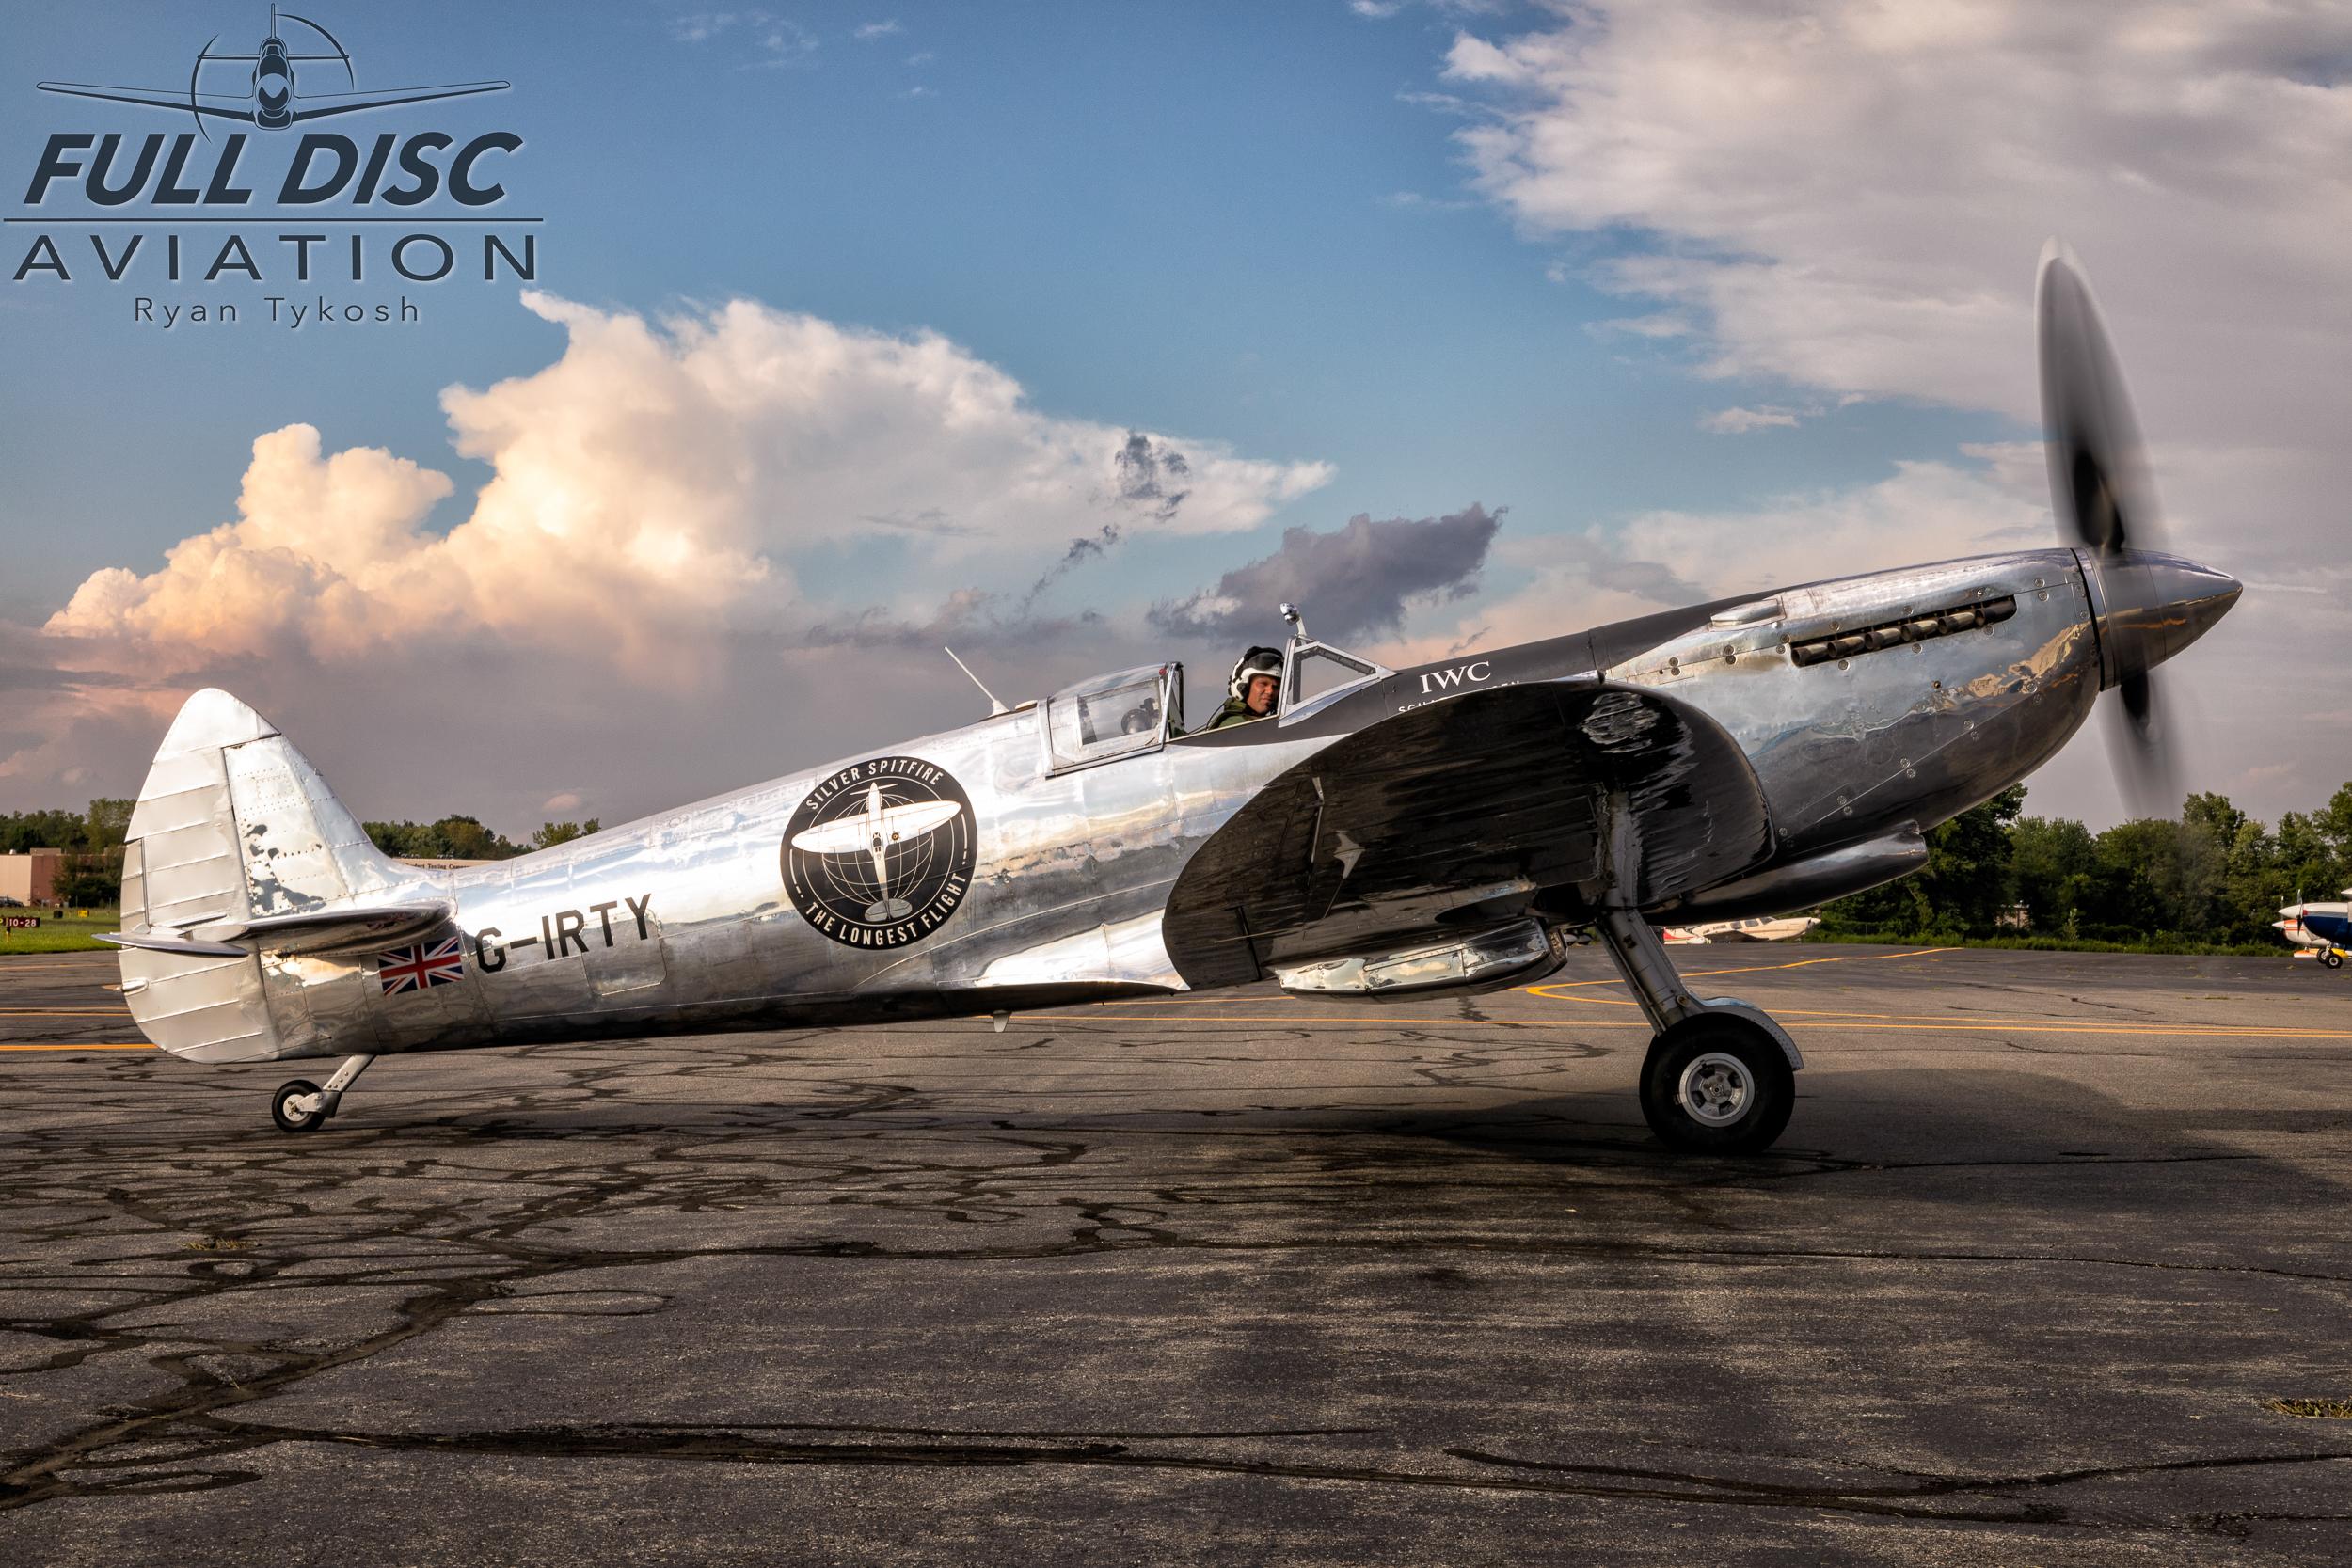 Silver Spitfire - Full Disc Aviation - Ryan Tykosh_August 21, 2019_03.jpg